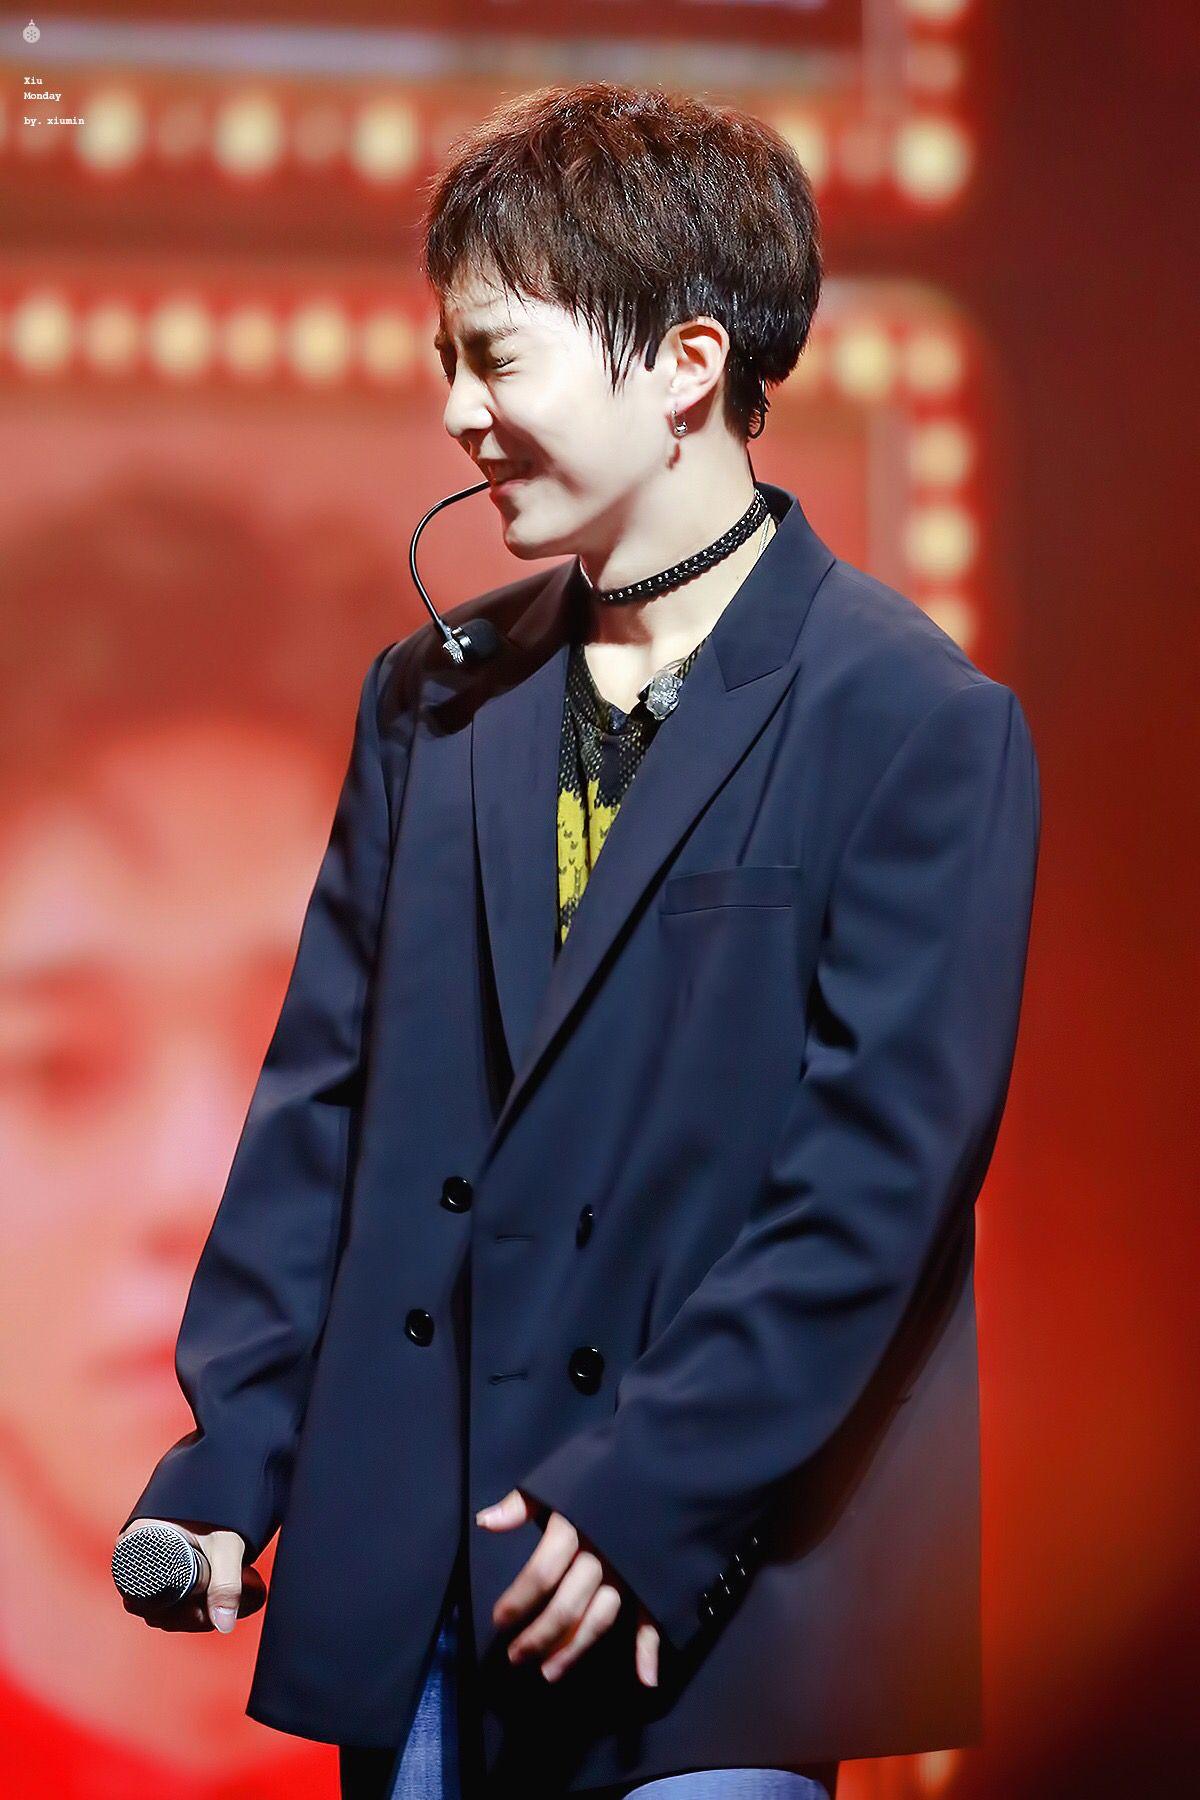 Xiumin Hq 180915 Music Bank In Berlin Exo Kim Minseok Kim Minseok Exo Exo Xiumin Kim Min Seok